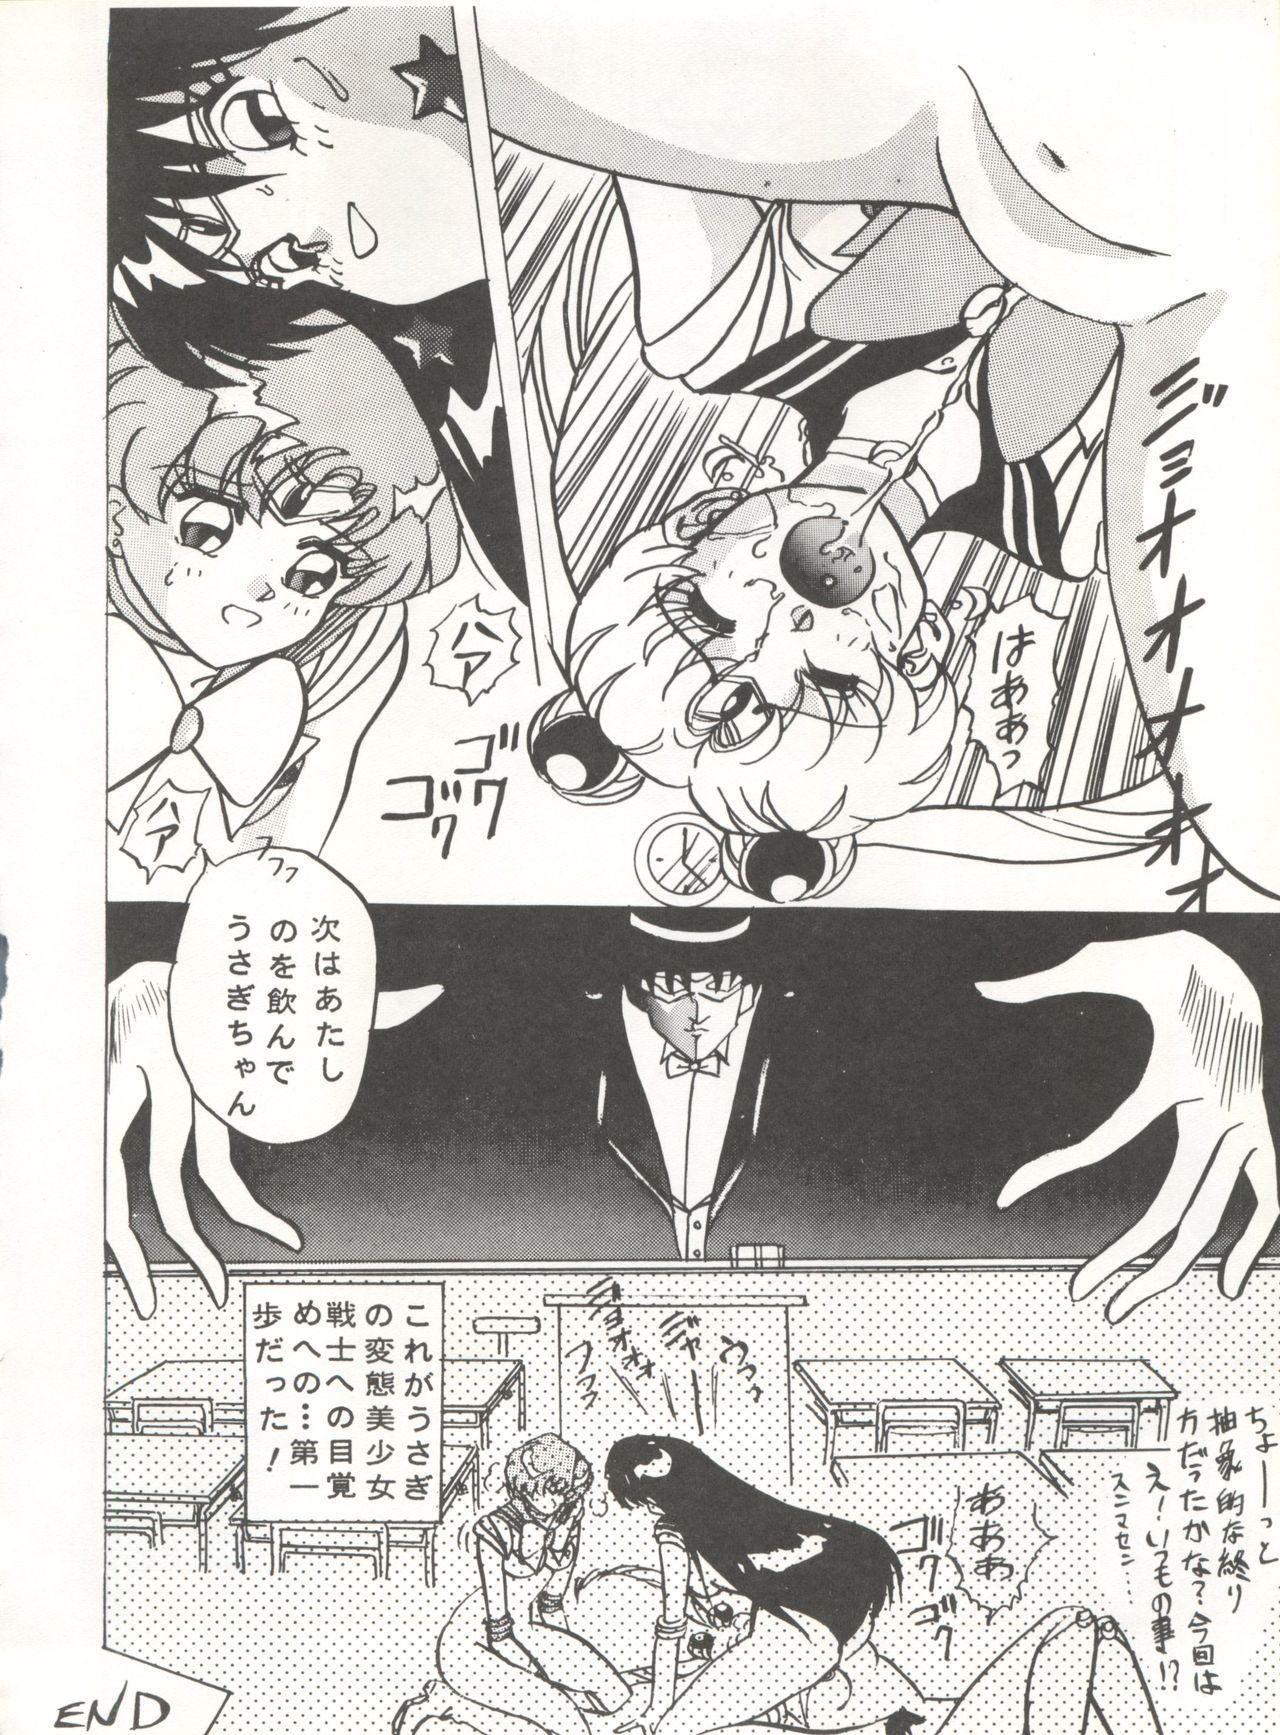 [Global One (MARO)] Sadistic 5 (Cutey Honey, Devilman, Sailor Moon), [Global One (MARO)] Sadistic (Dirty Pair, Fushigi no Umi no Nadia, Sailor Moon), [Studio Ikkatsumajin] .ribbon (Hime-chan's Ribbon) 59